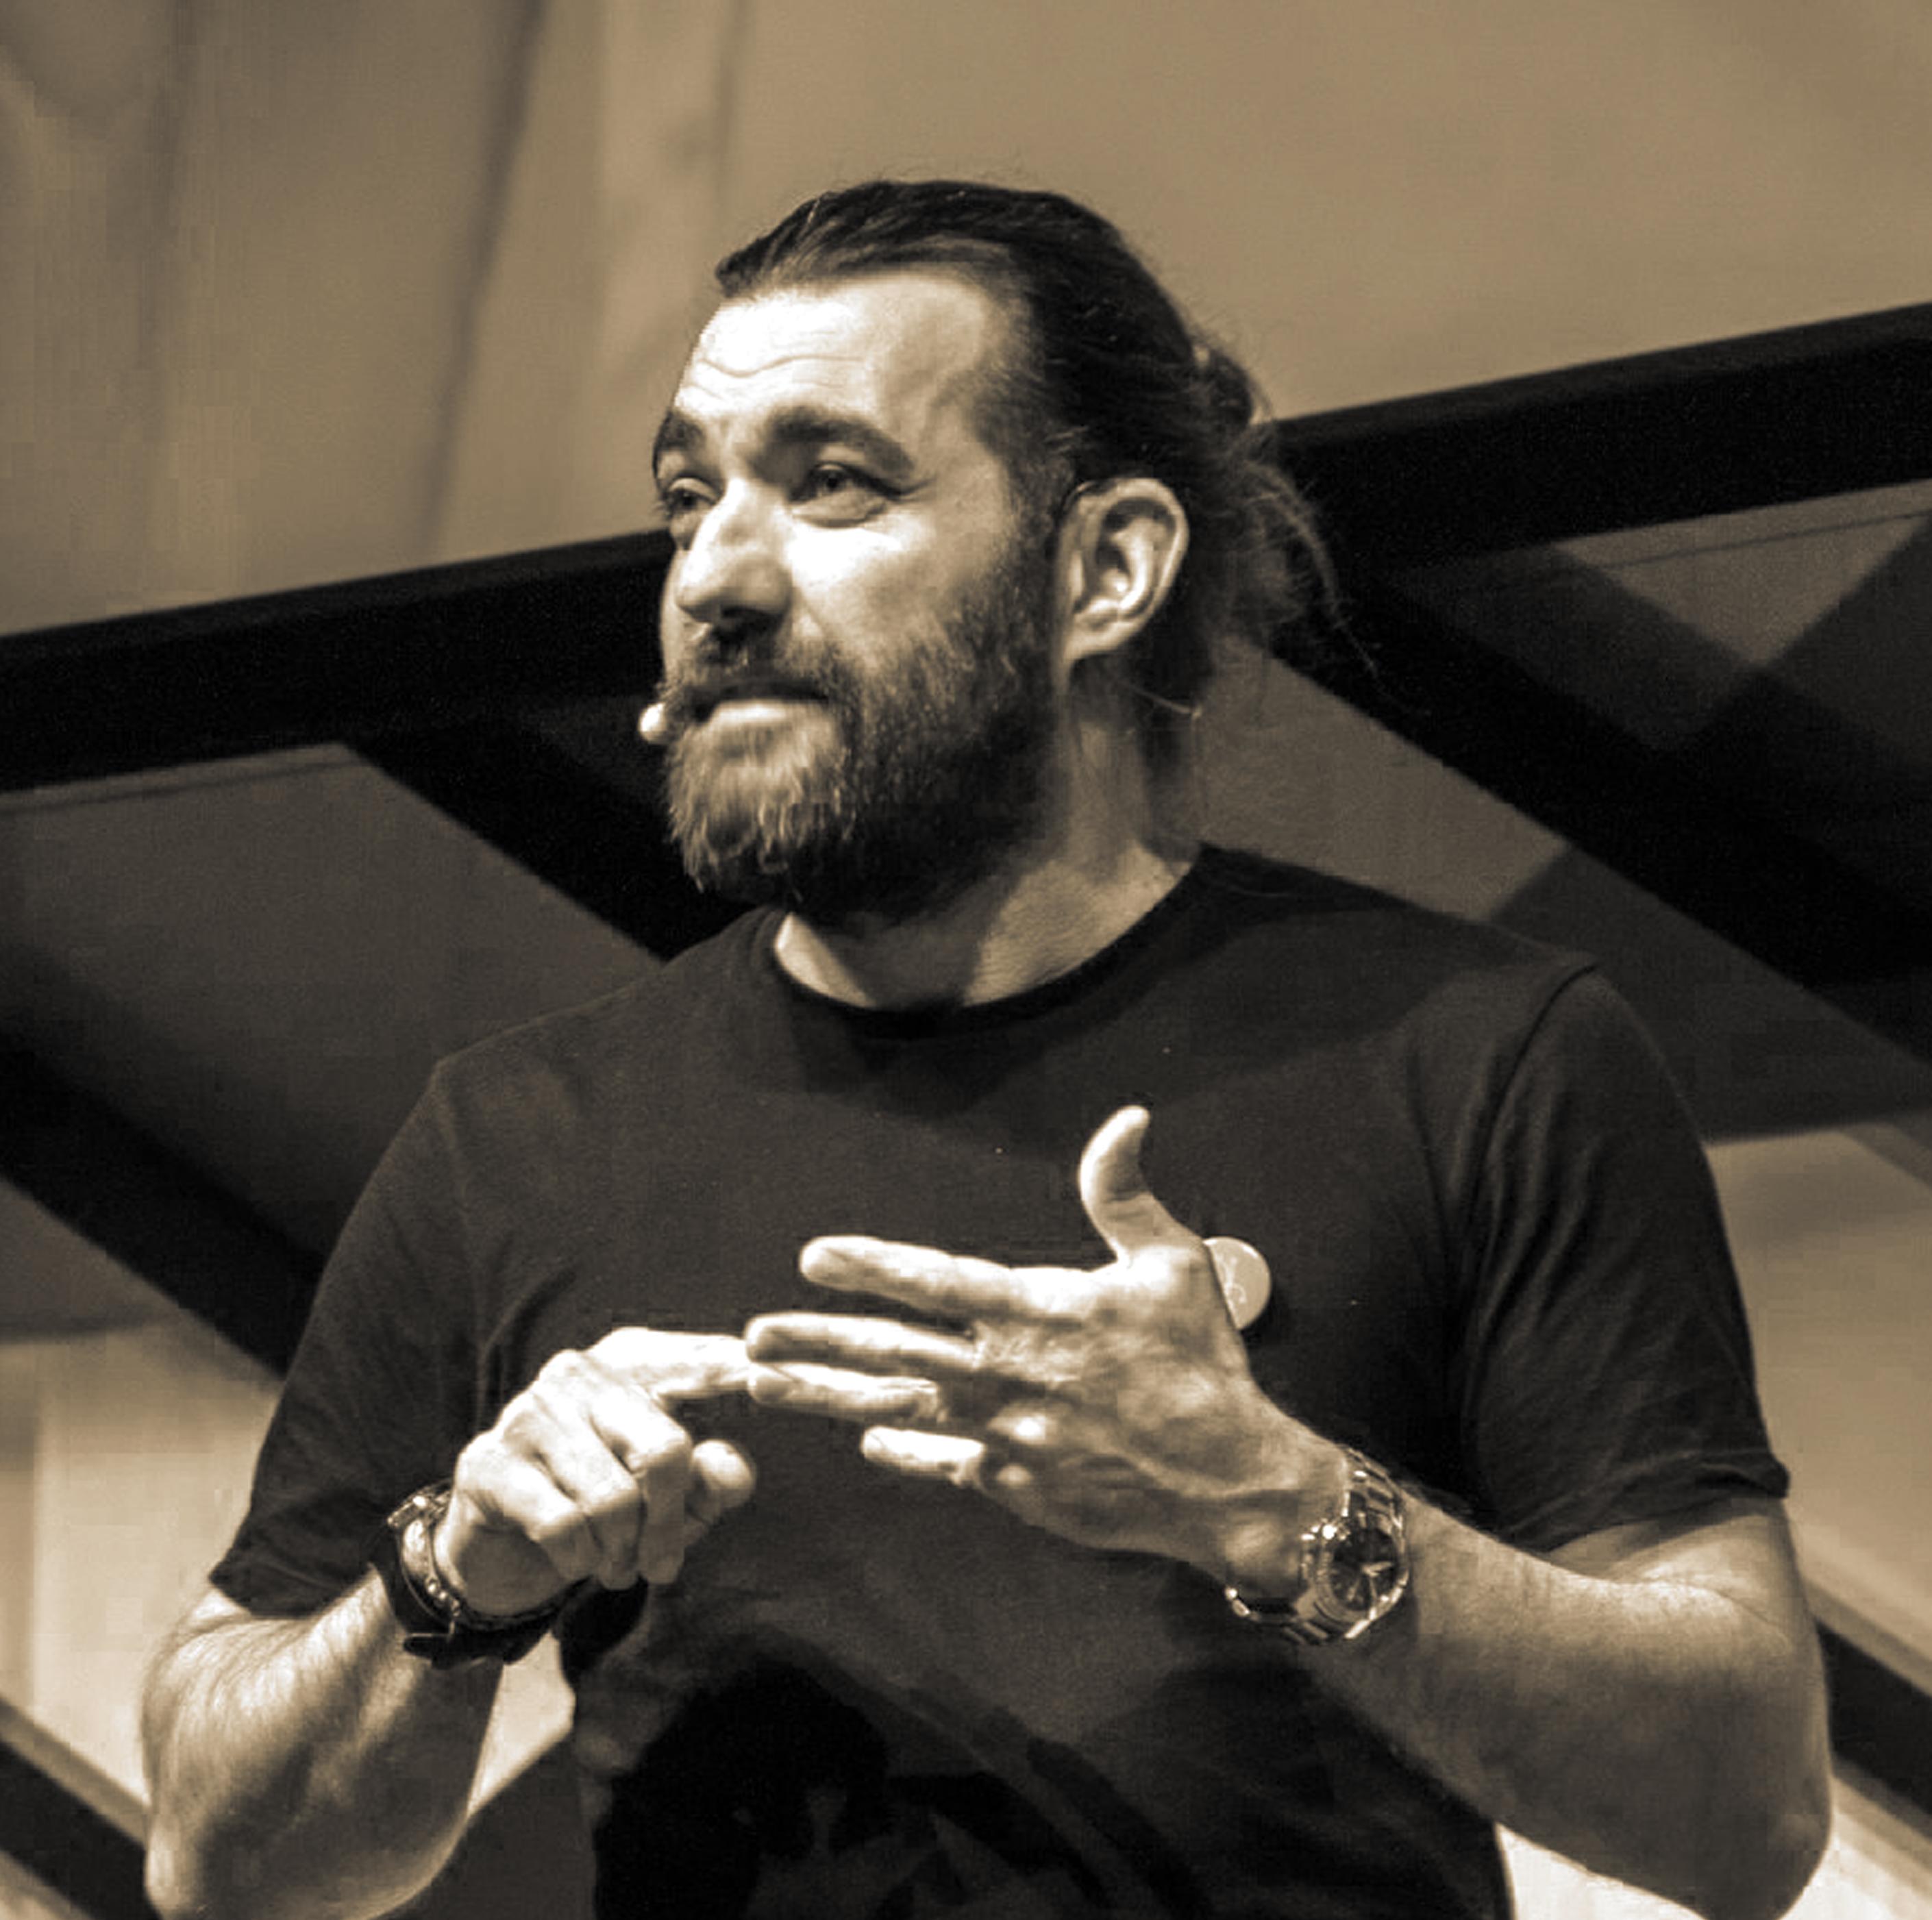 Santiago Cosme